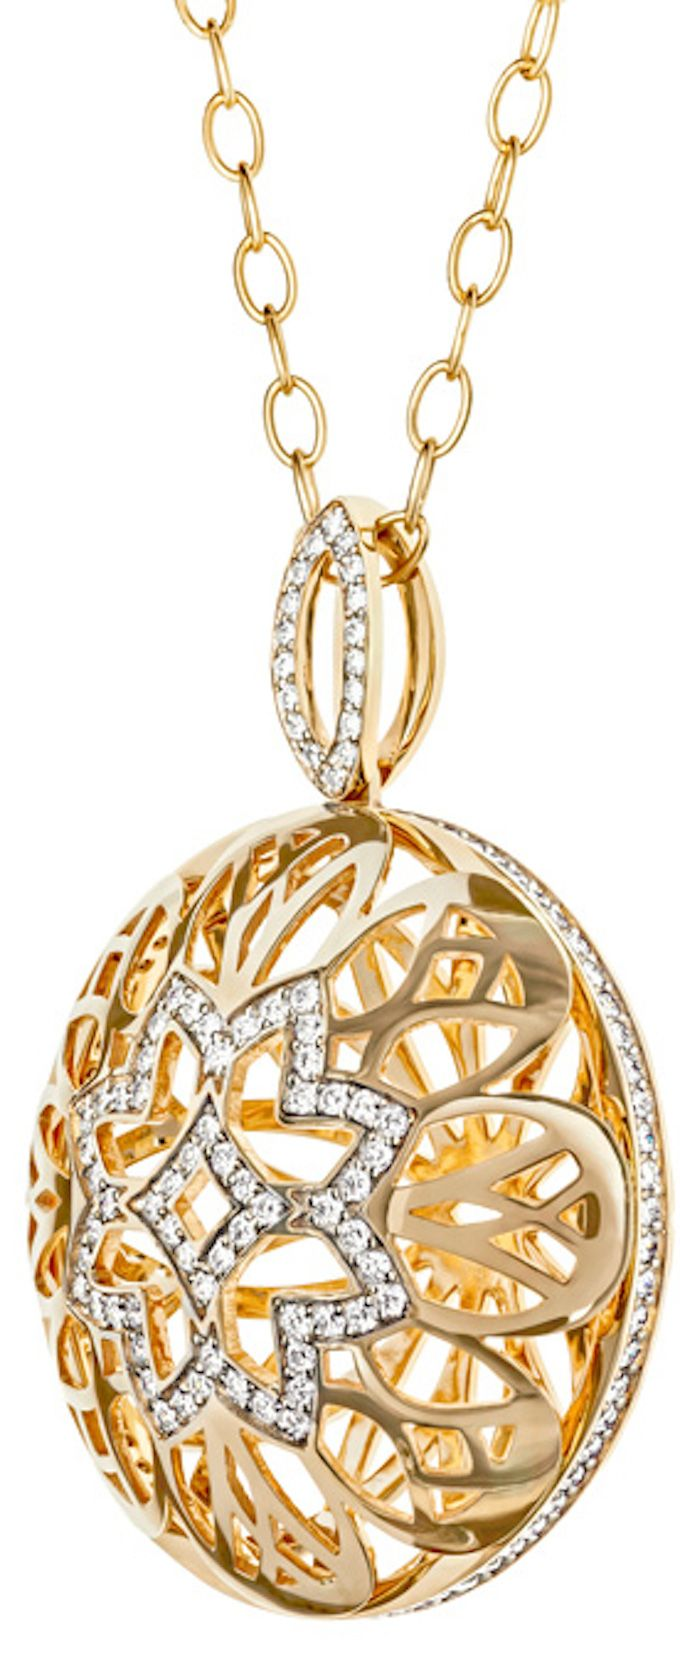 Pendant - Gold and Diamonds